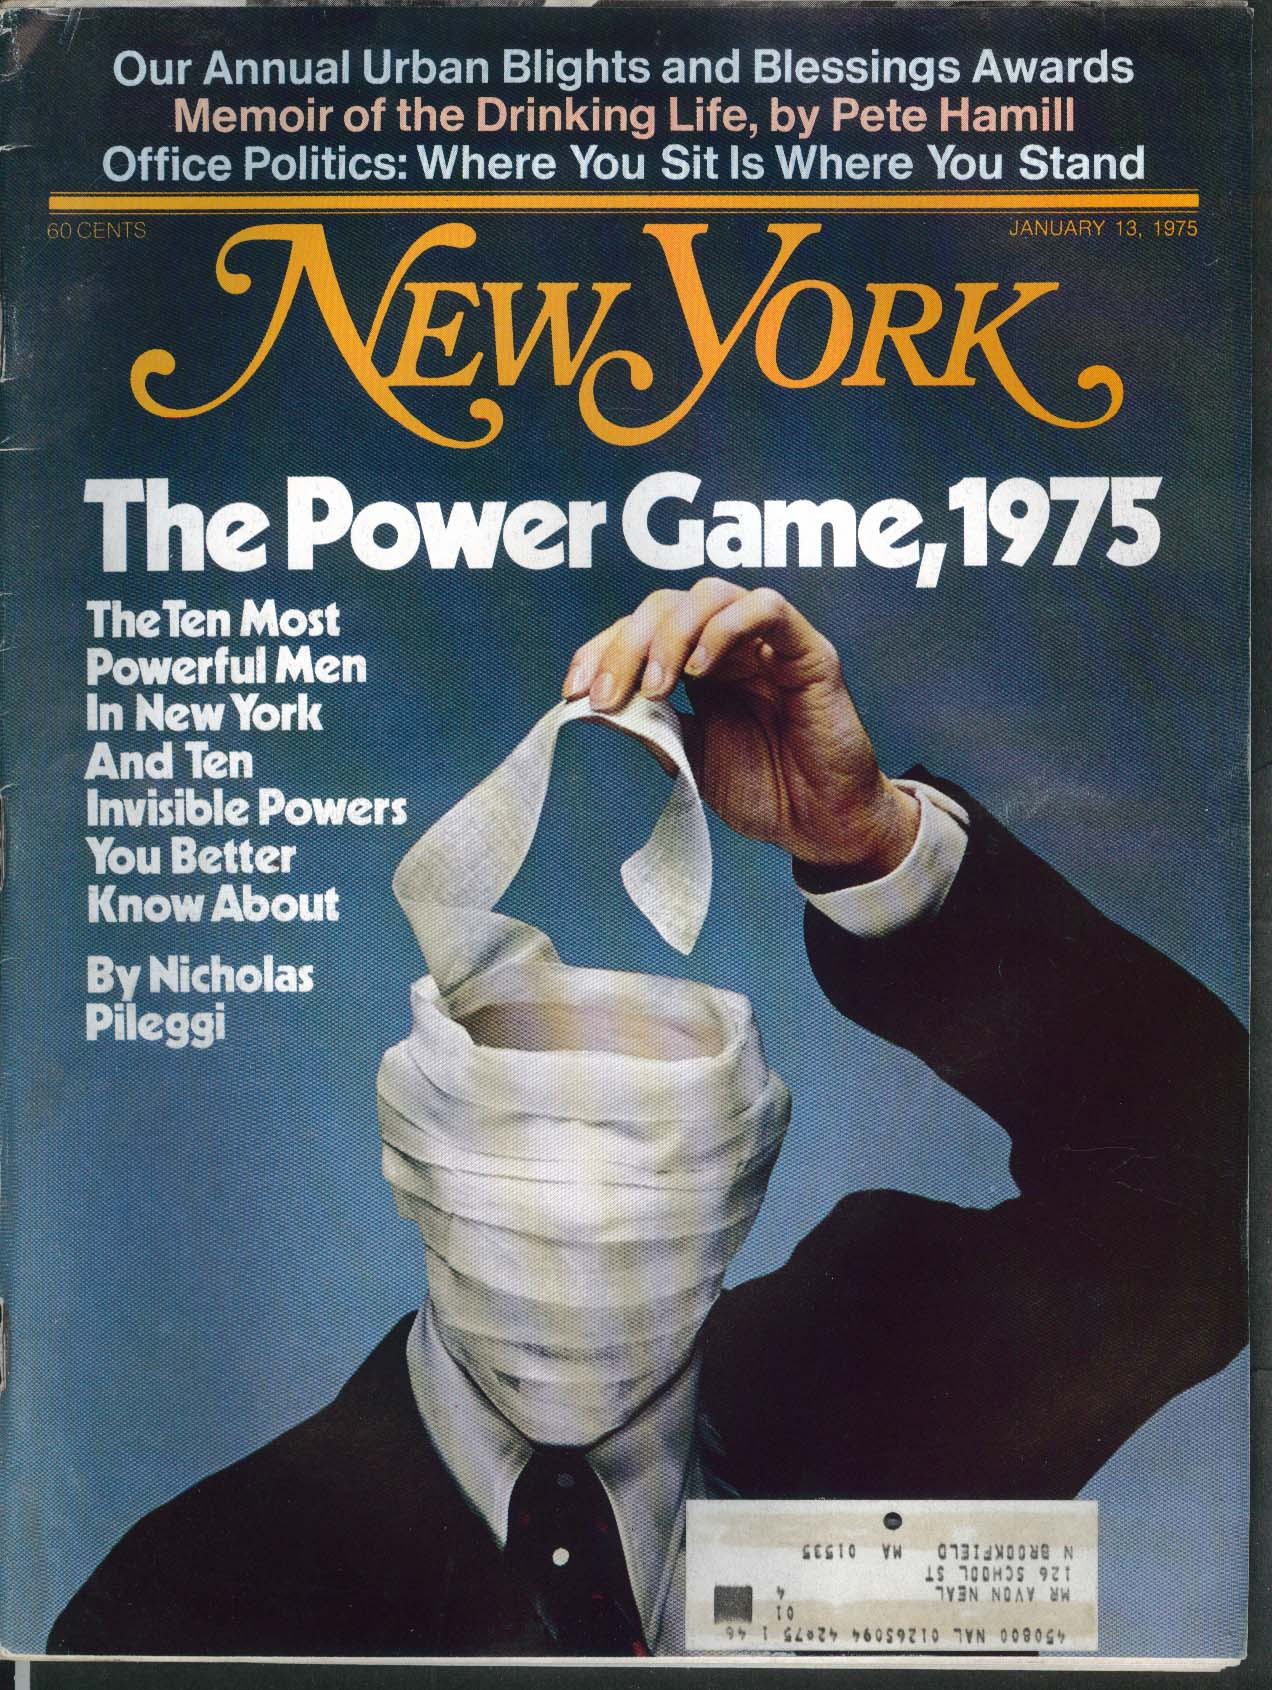 NEW YORK Nicholas Pileggi Michael Korda Pete Hamill Peter Blake + 1/13 1975